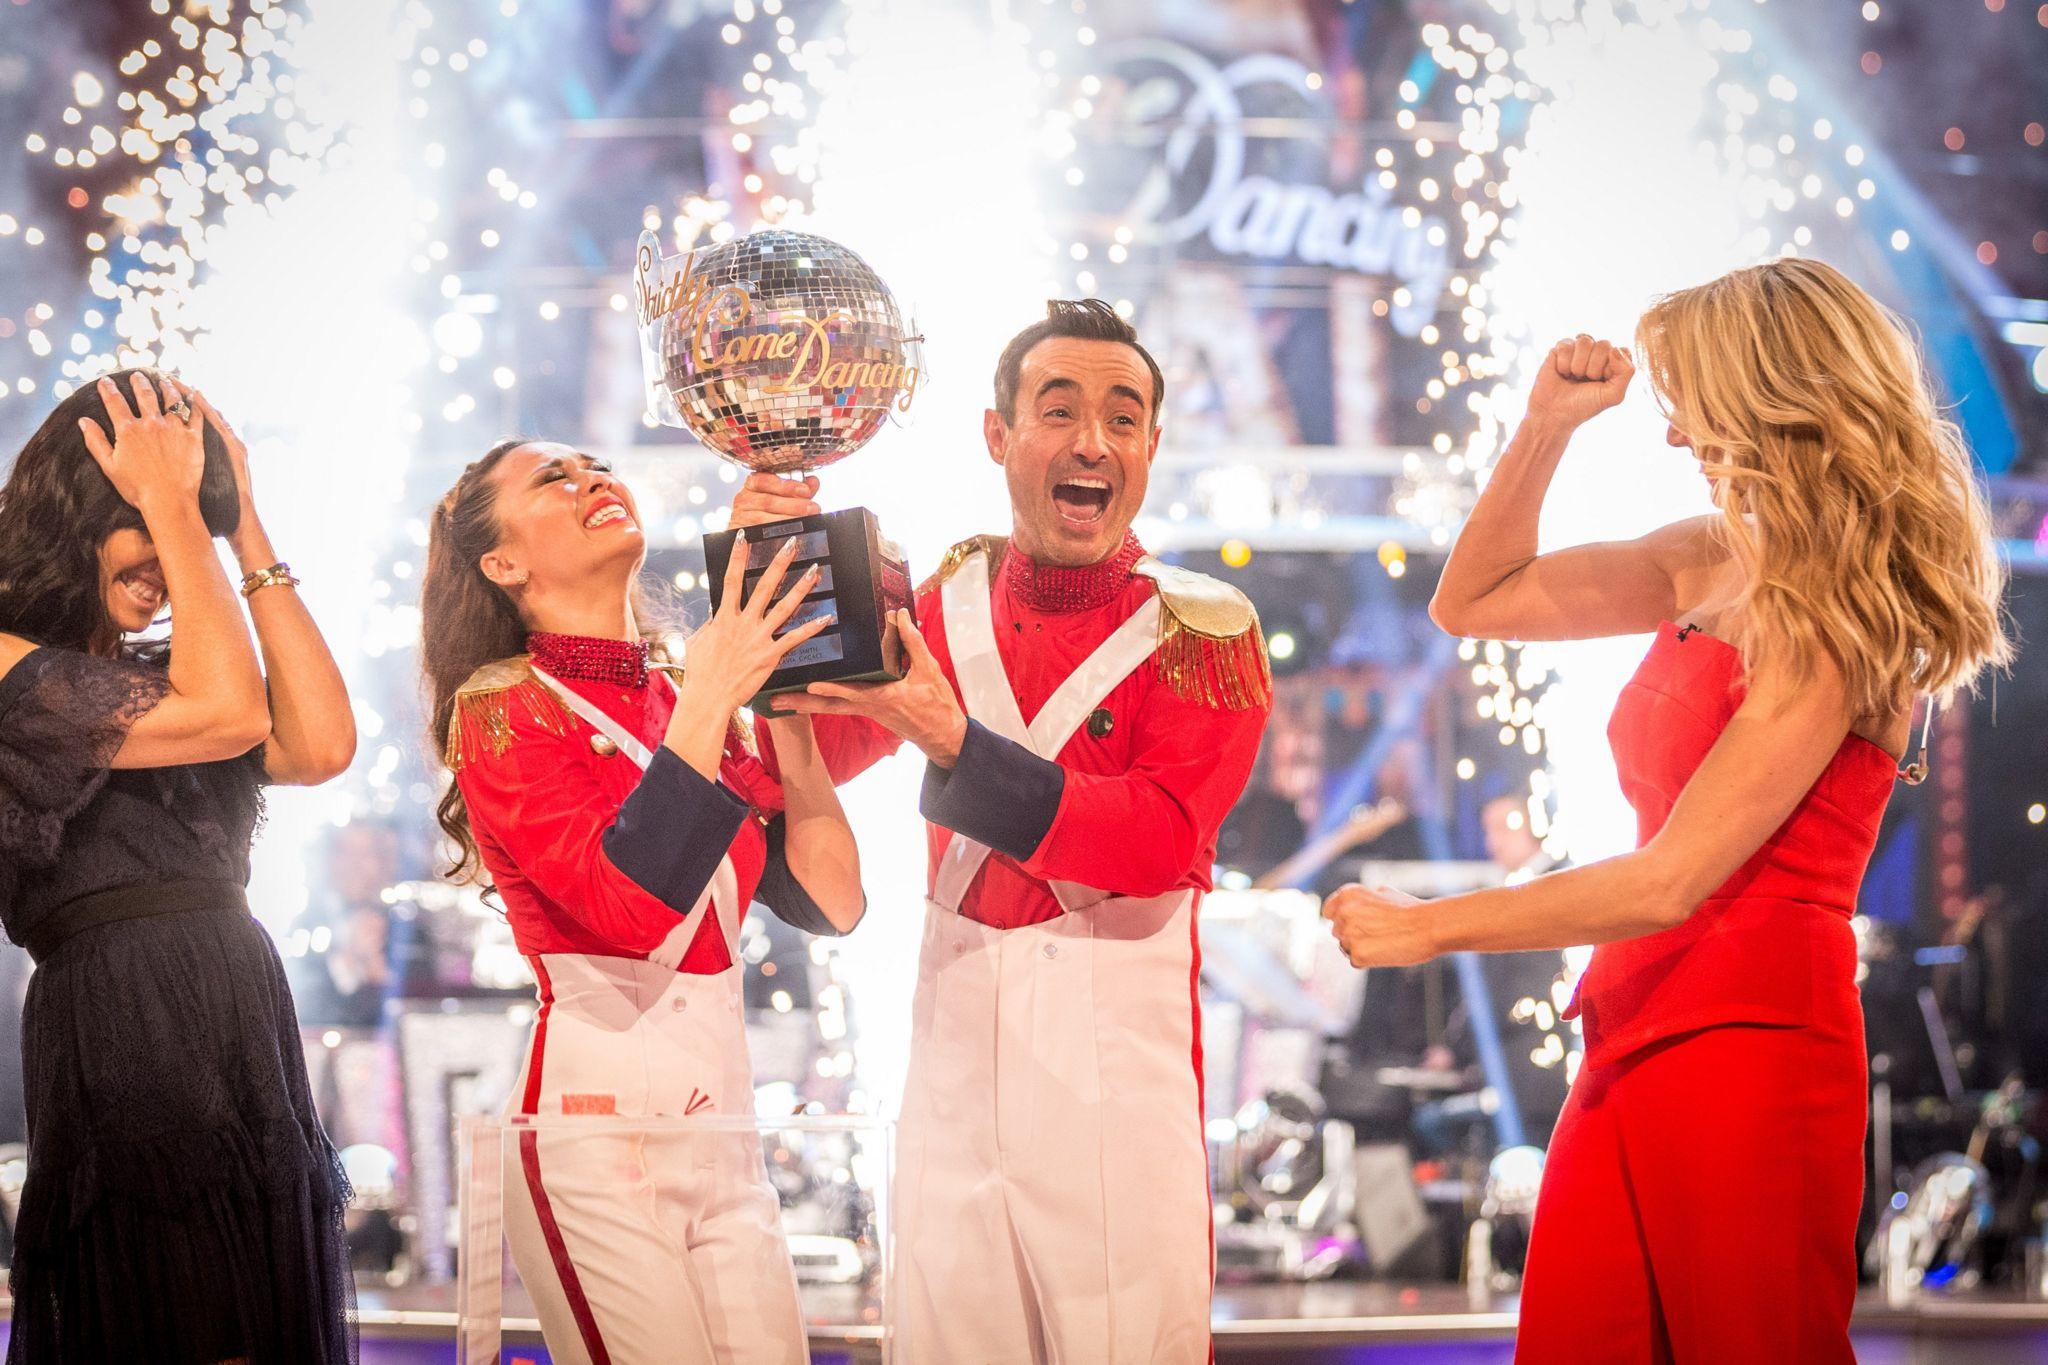 Joe McFadden wins Strictly Come Dancing in 2017